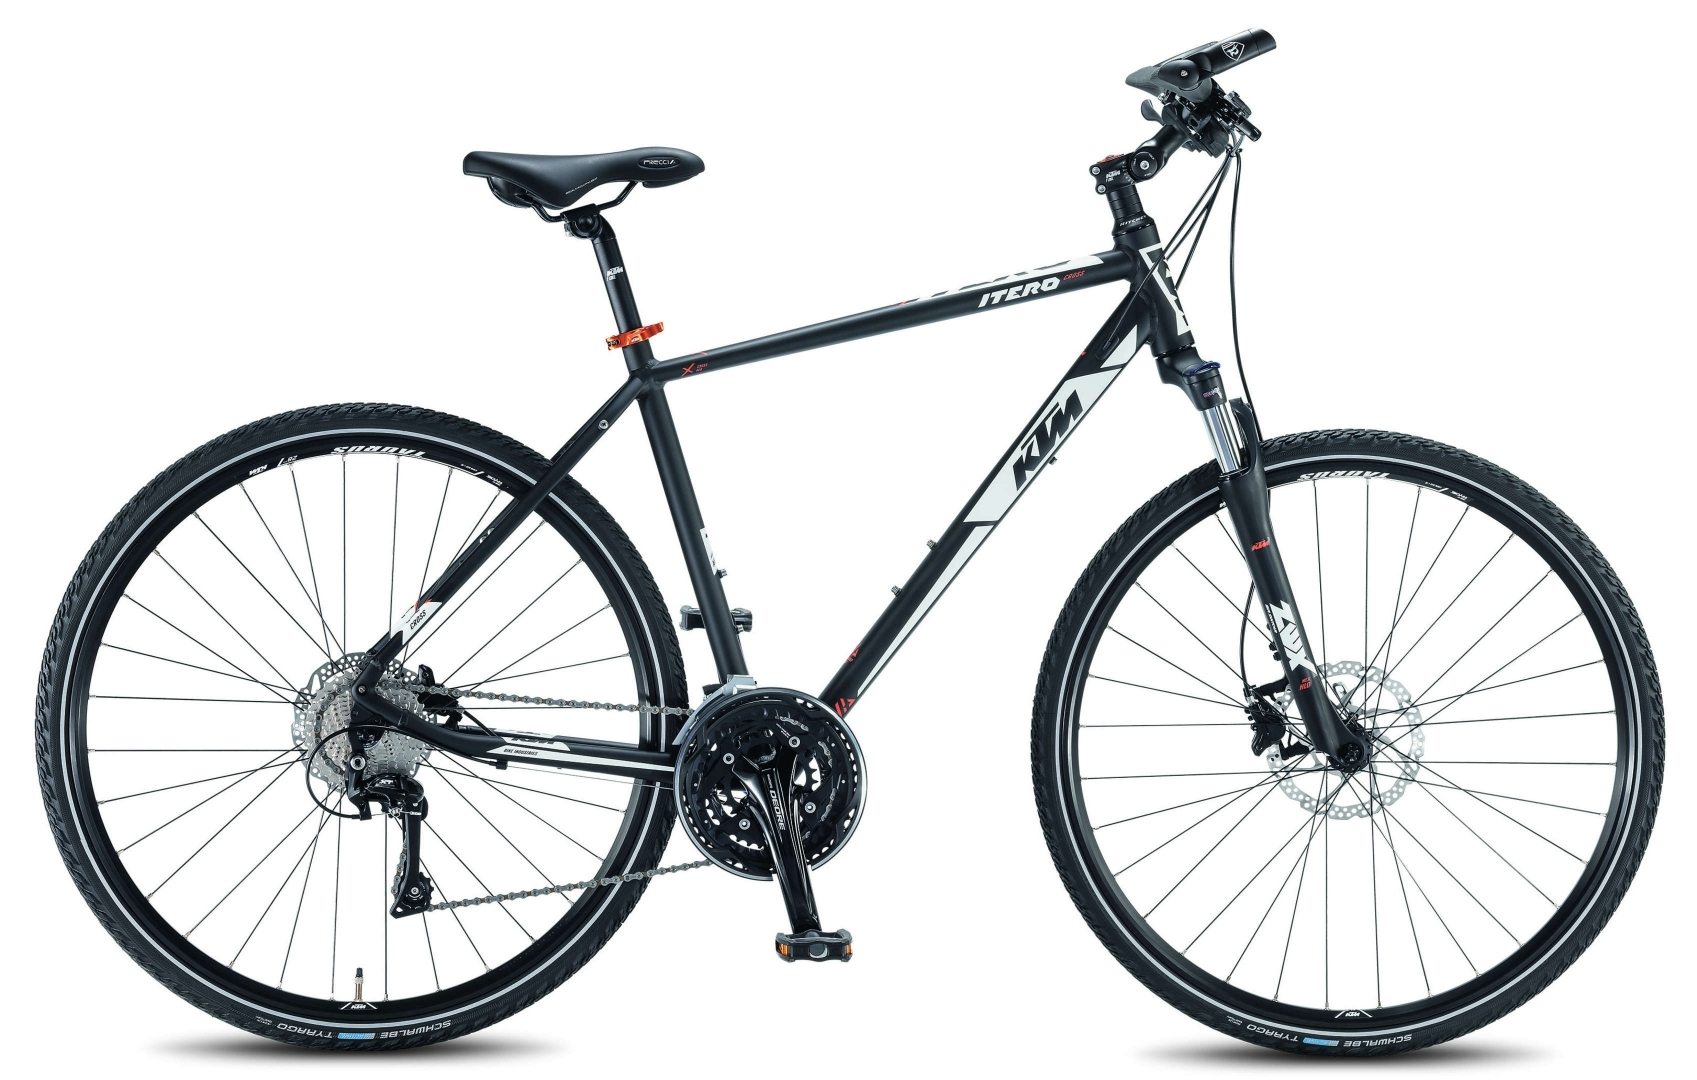 herren crossbike ktm itero cross 28 zoll fahrrad shimano 30 gang schwarz 51 cm ebay. Black Bedroom Furniture Sets. Home Design Ideas